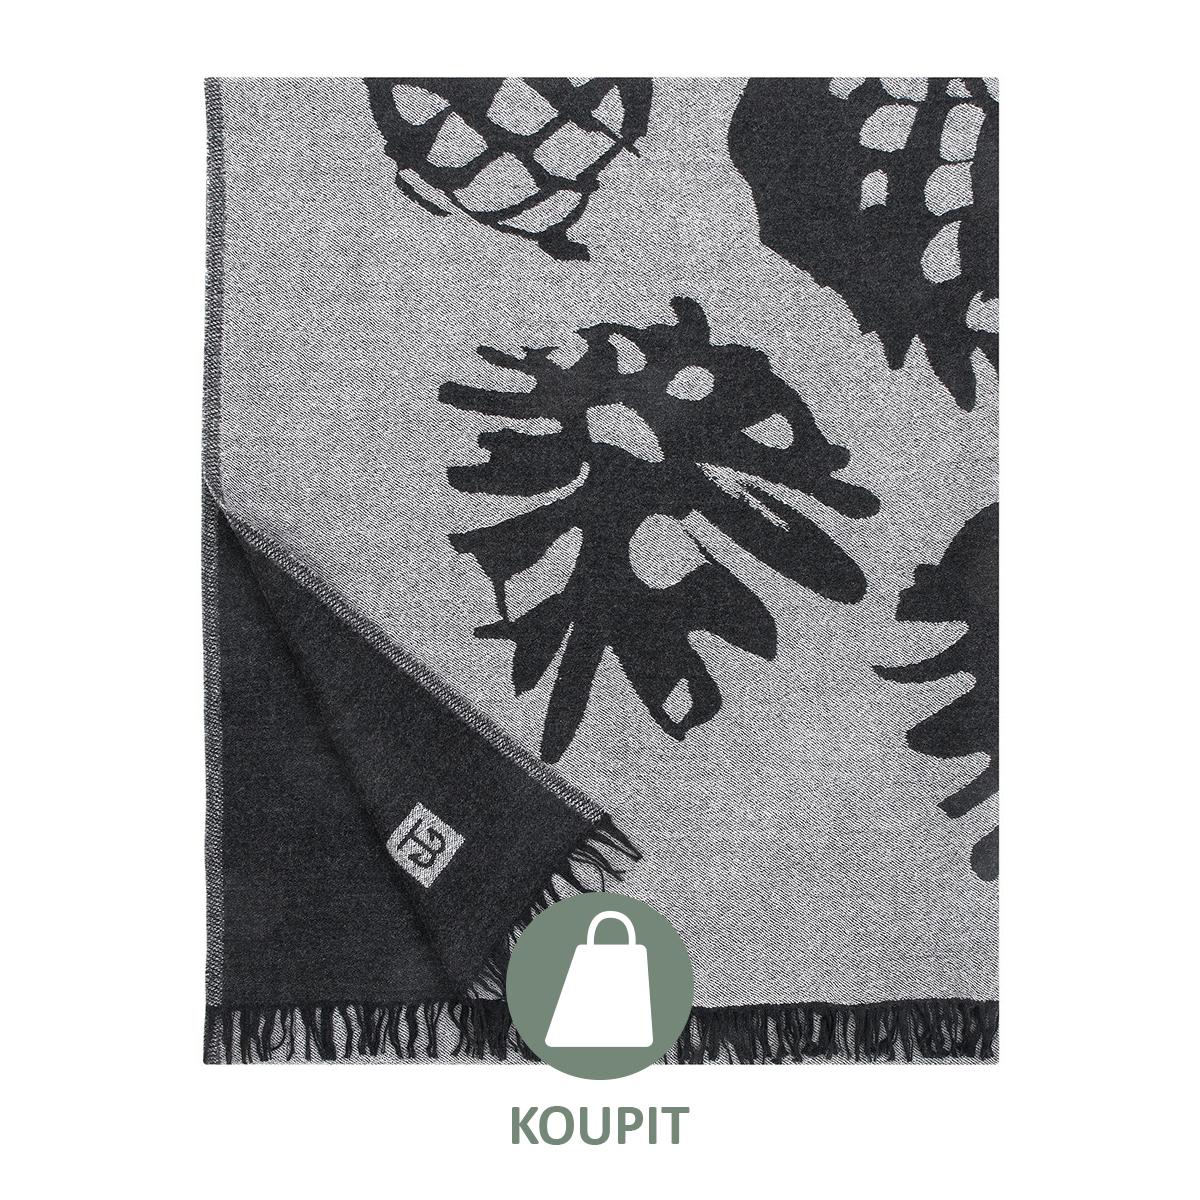 nova-finska-znacka-lapuan-kankurit-produkt3